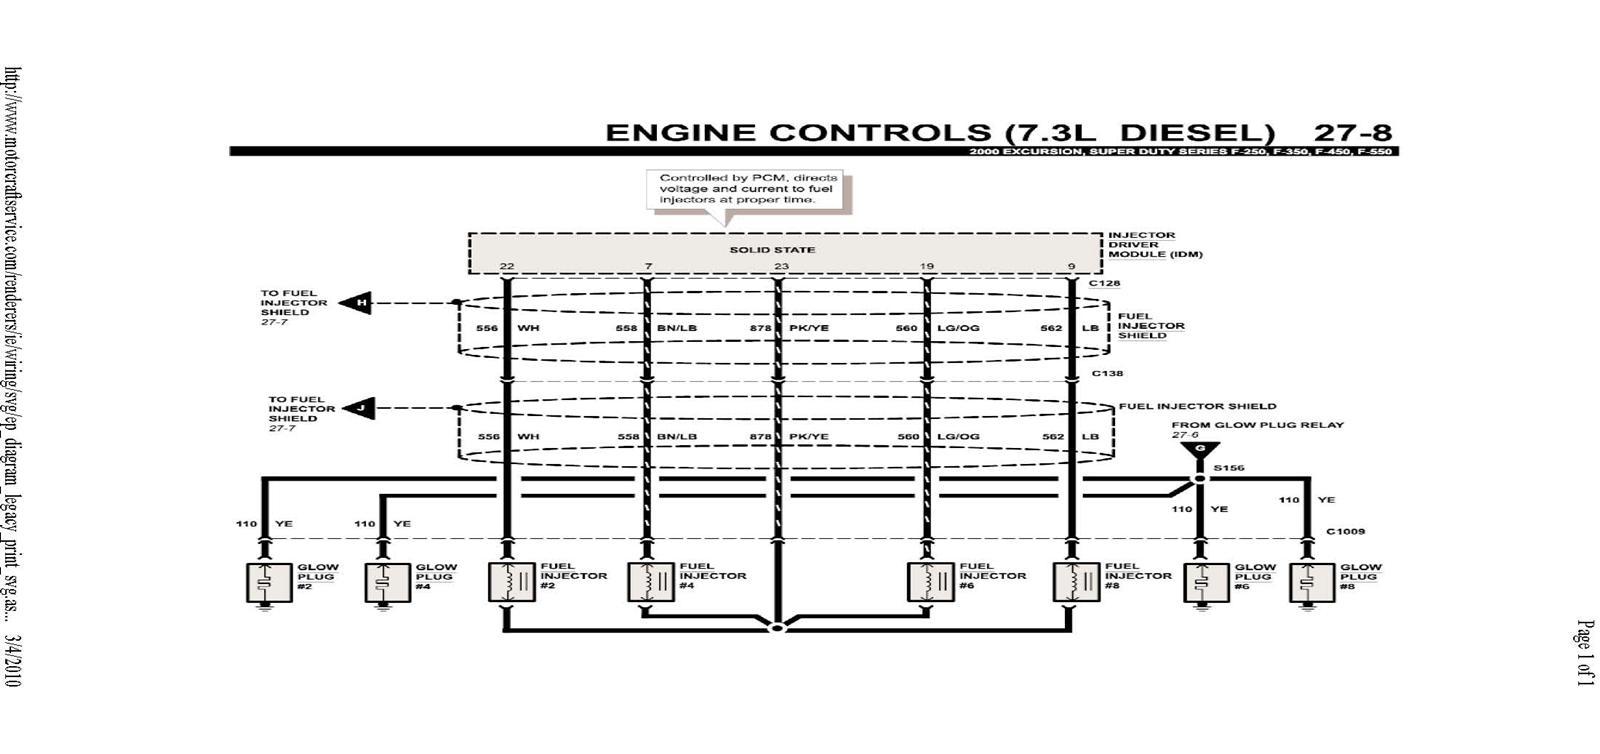 Admirable 1988 F350 Glow Plug Wiring Harness Wiring Diagram Wiring Cloud Histehirlexornumapkesianilluminateatxorg